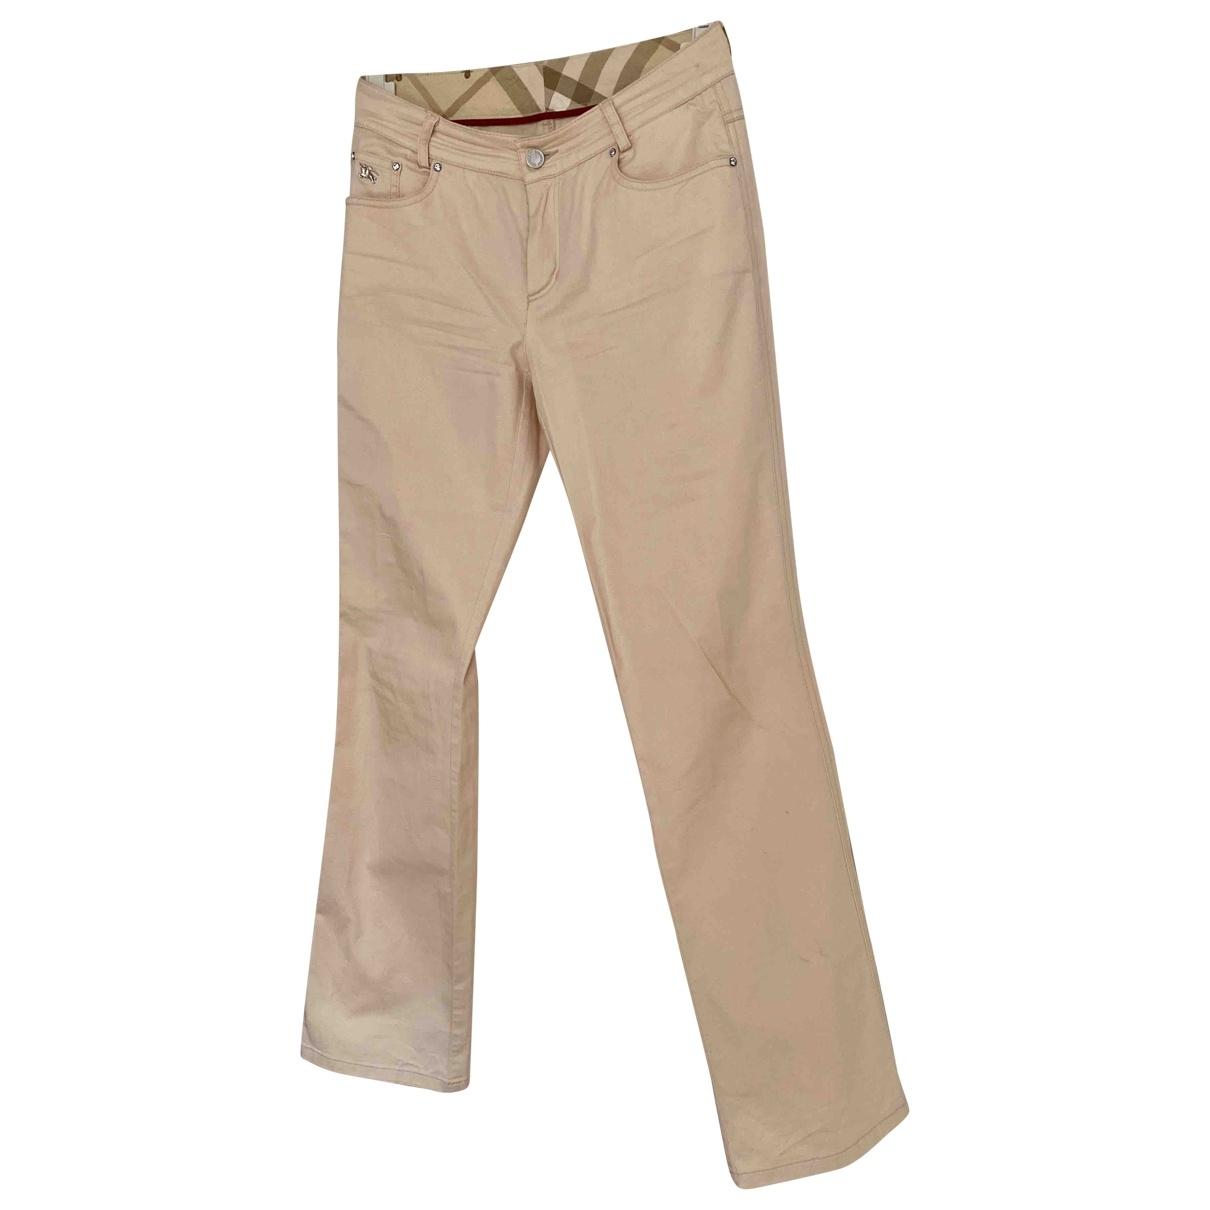 Burberry \N Beige Cotton Jeans for Women 38 FR